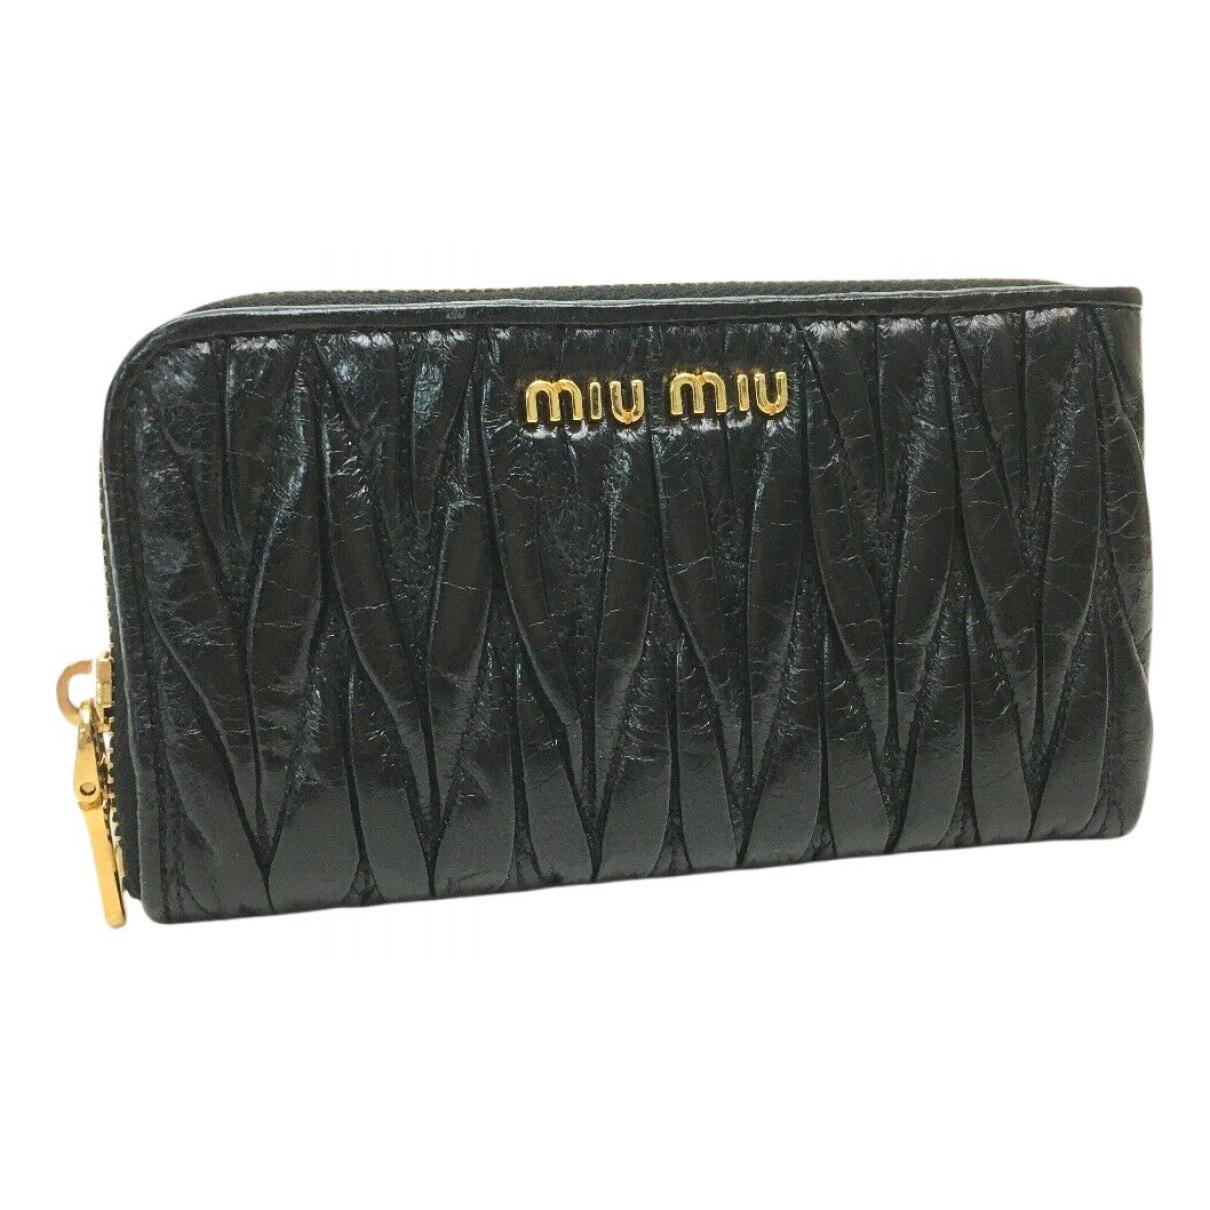 Miu Miu N Black Patent leather wallet for Women N